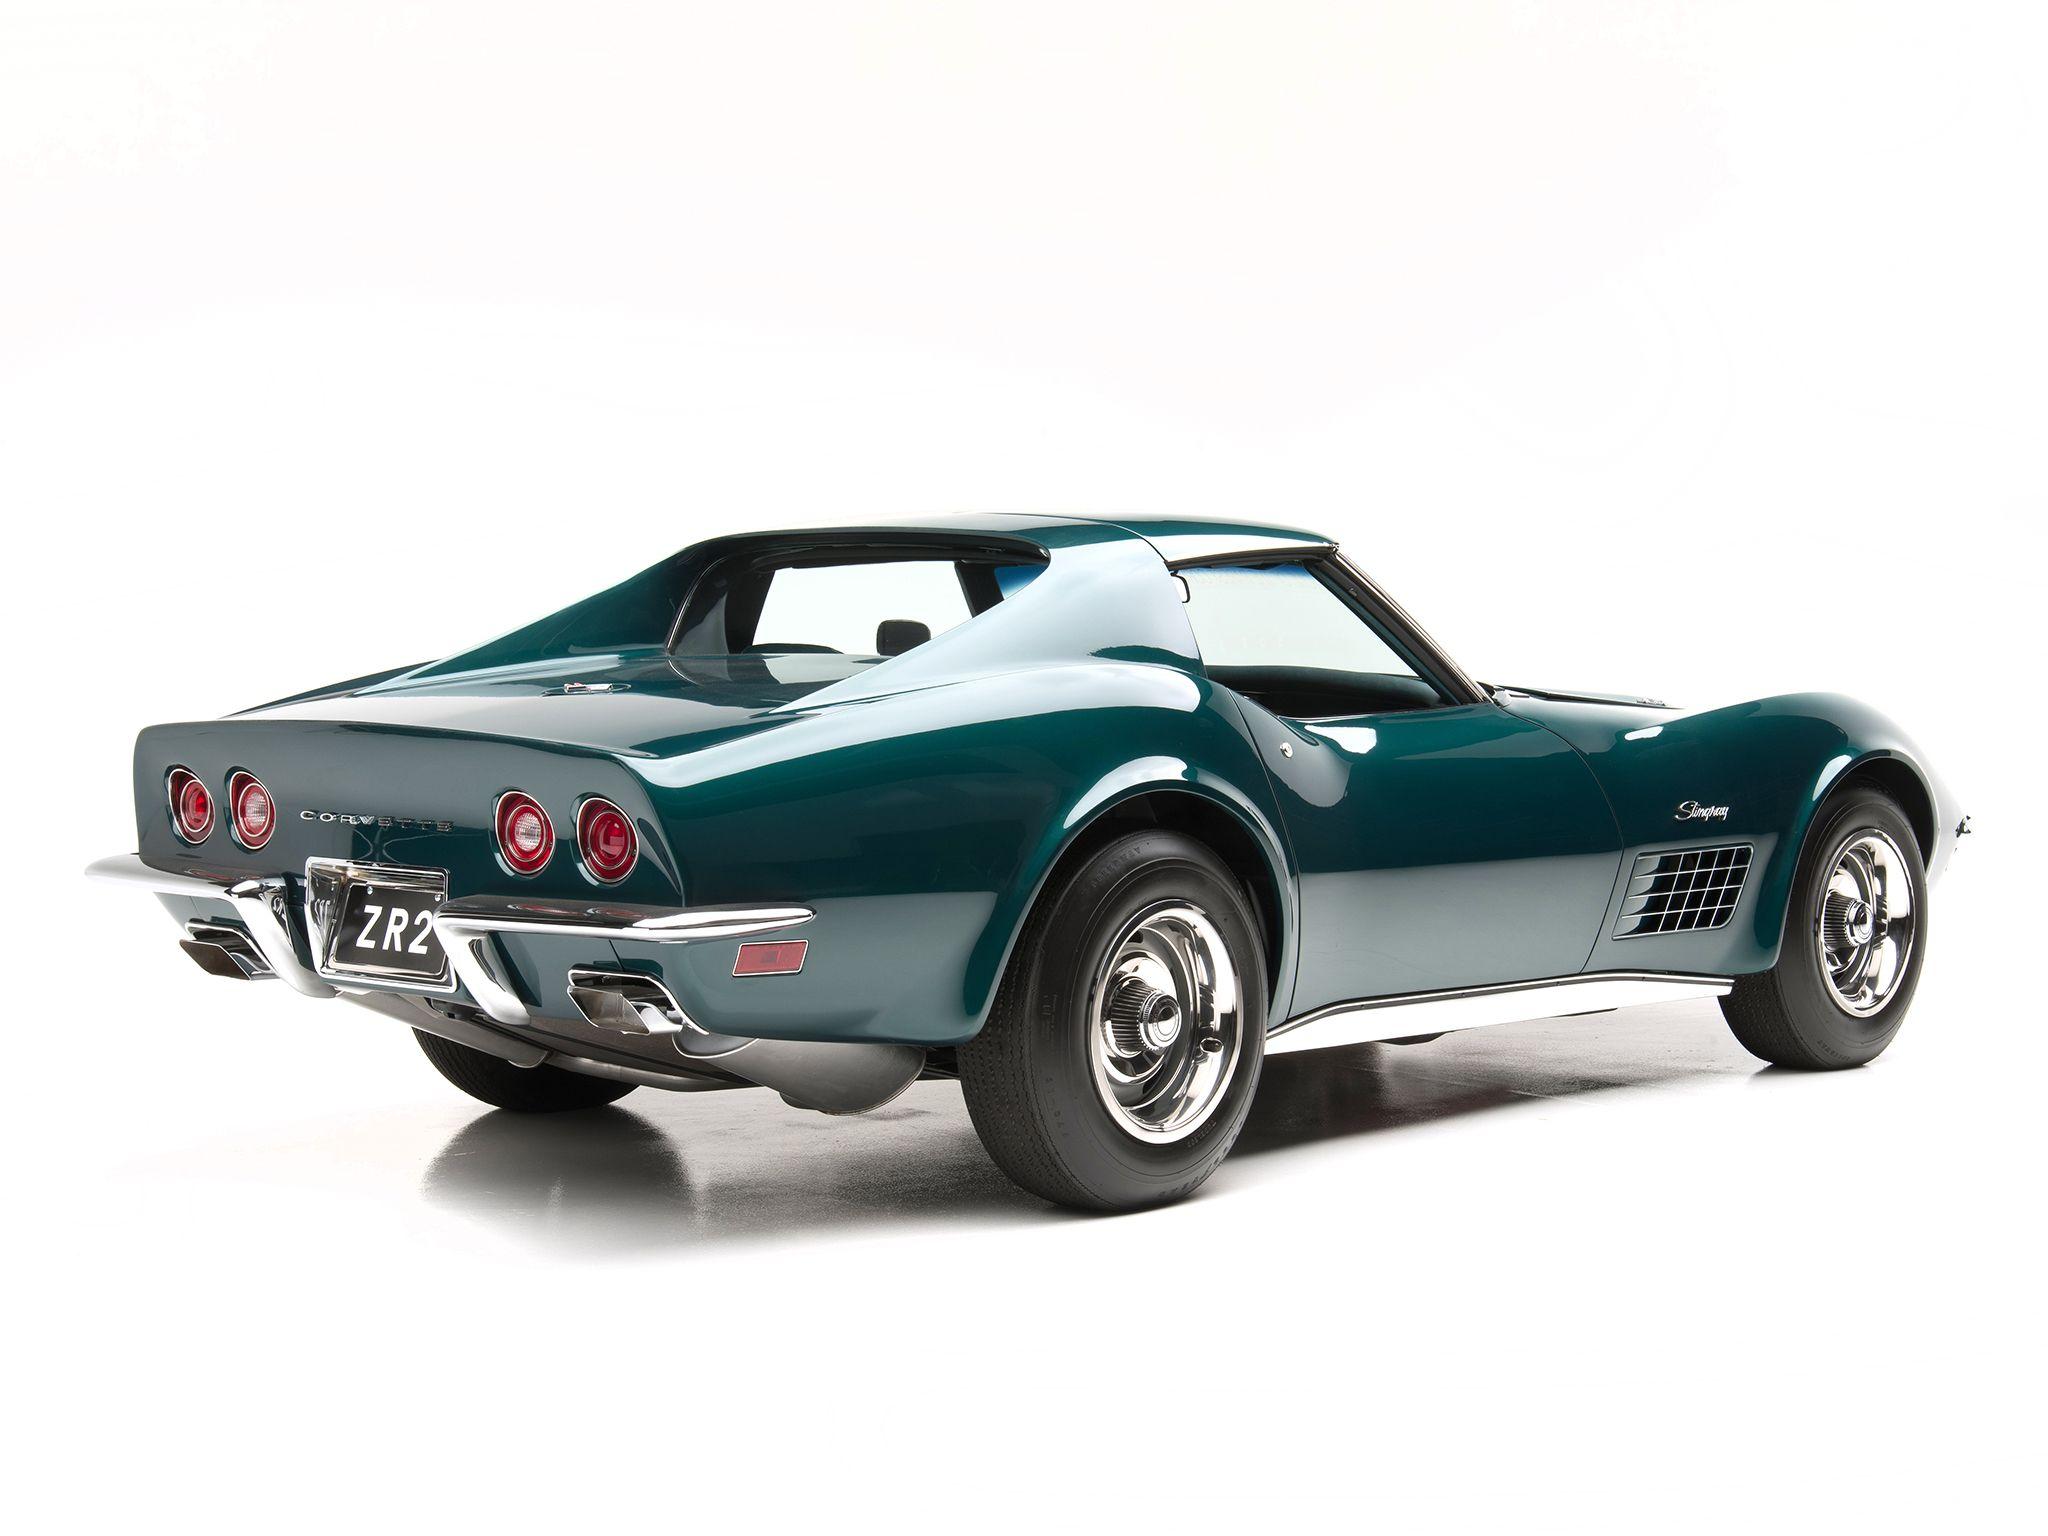 1971 C3 Stingray Zr 2 Ls6 Chevrolet Corvette Stingray Chevrolet